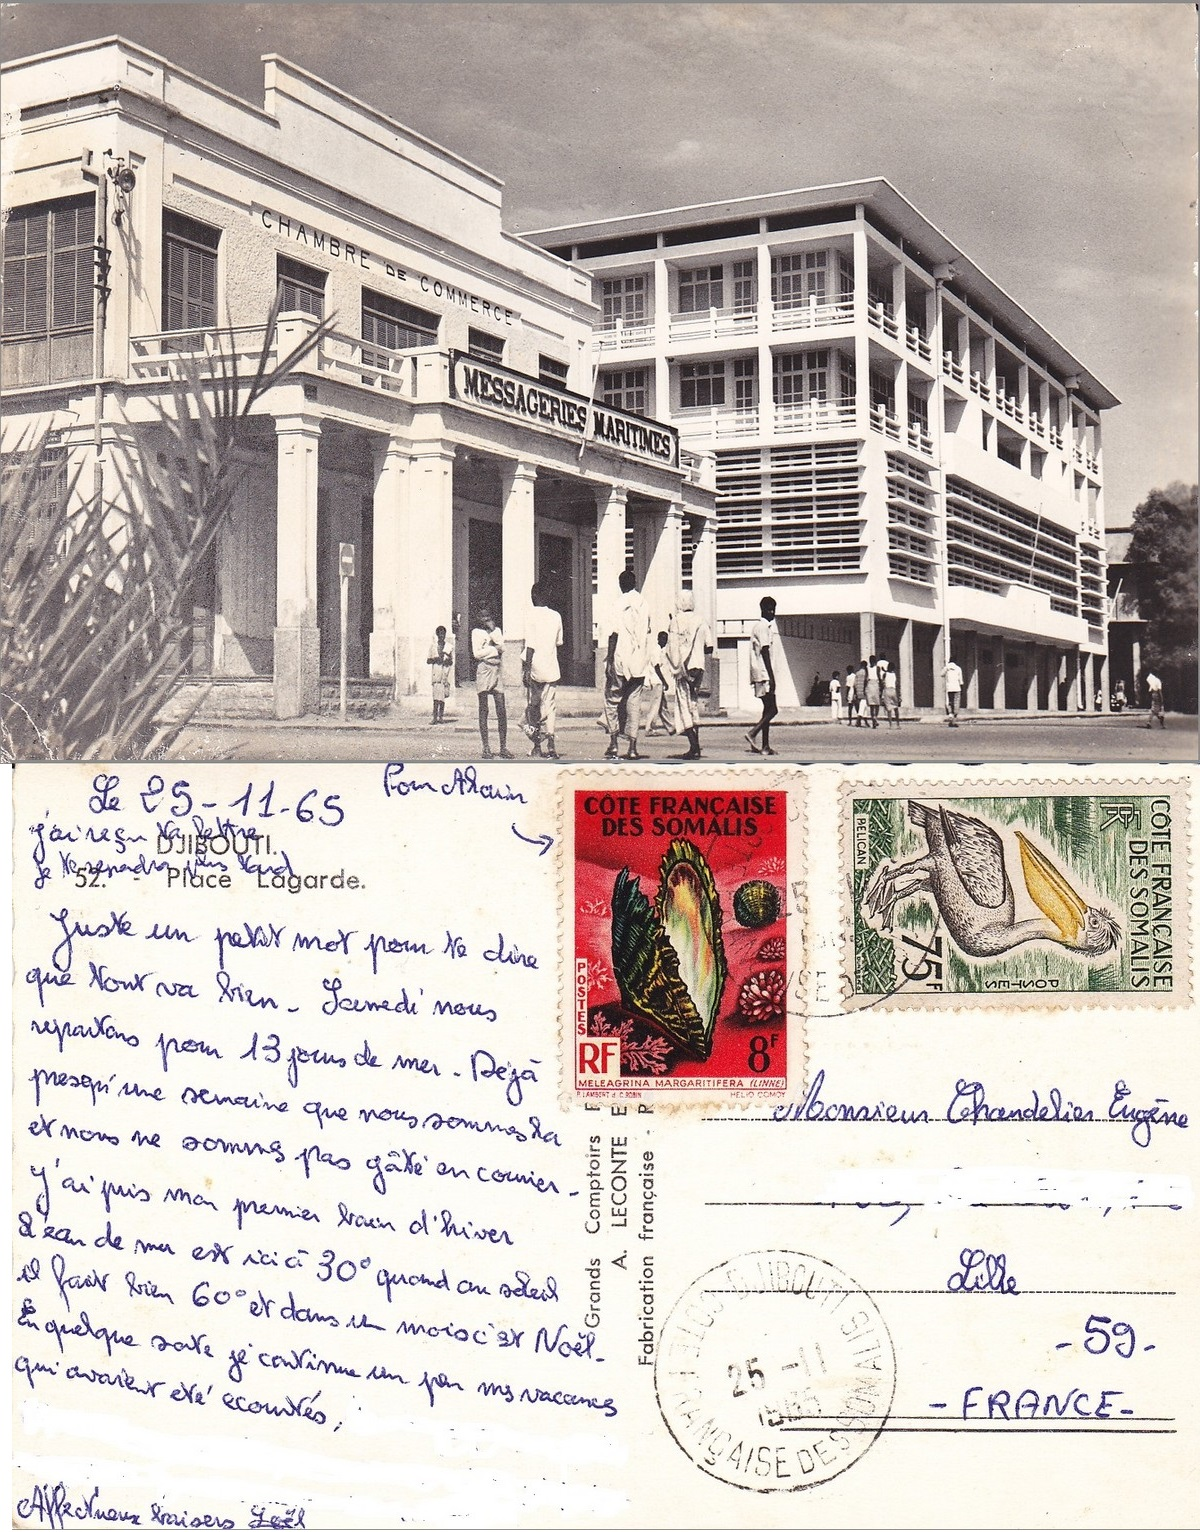 DJIBOUTI - LES BARS - Page 13 259642991